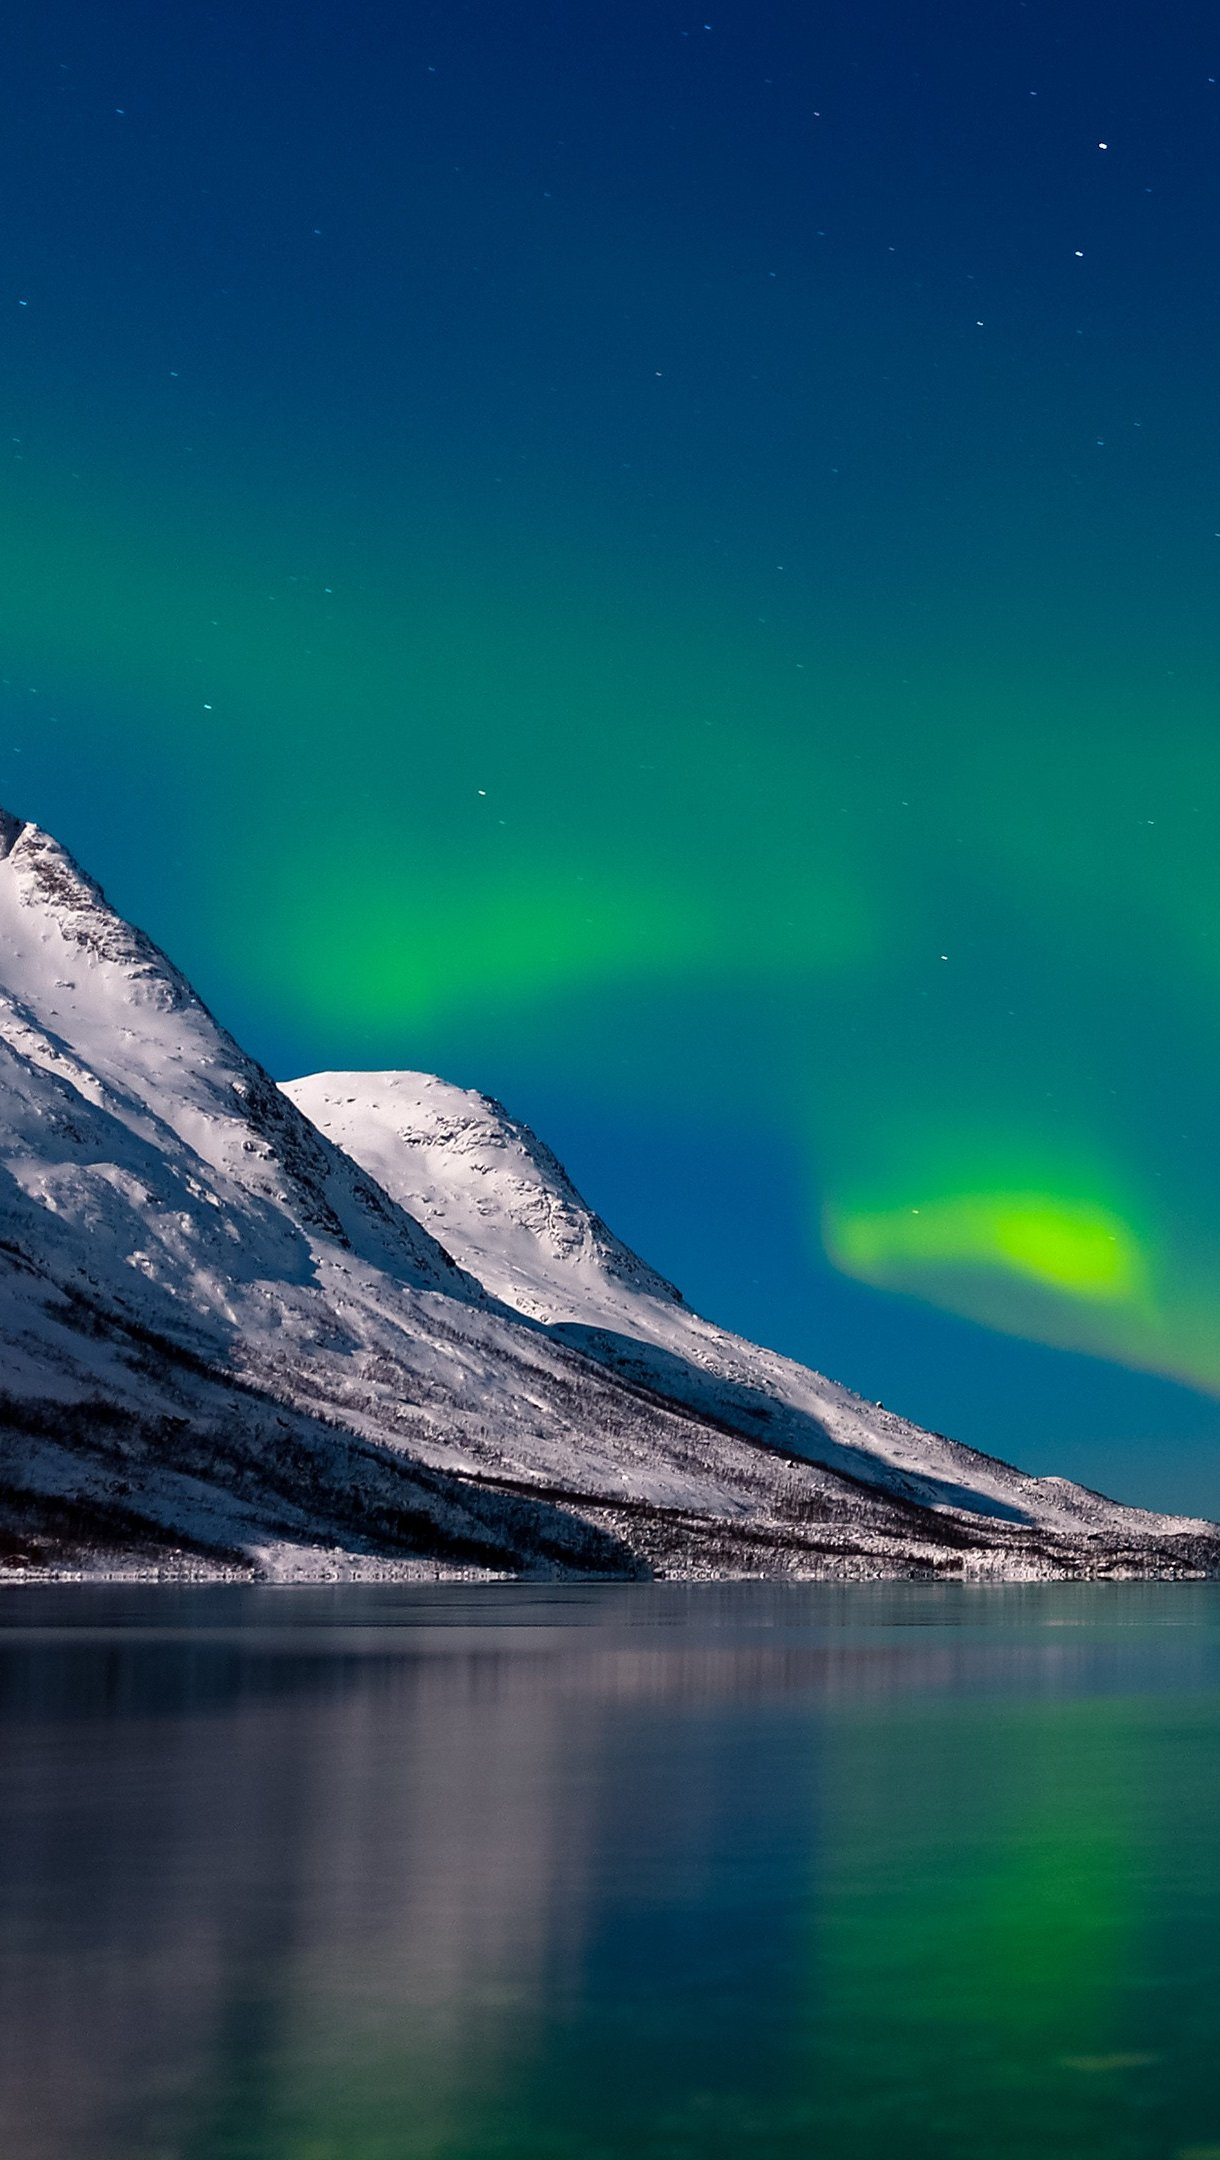 Wallpaper Aurora Borealis in lake and mountains Vertical